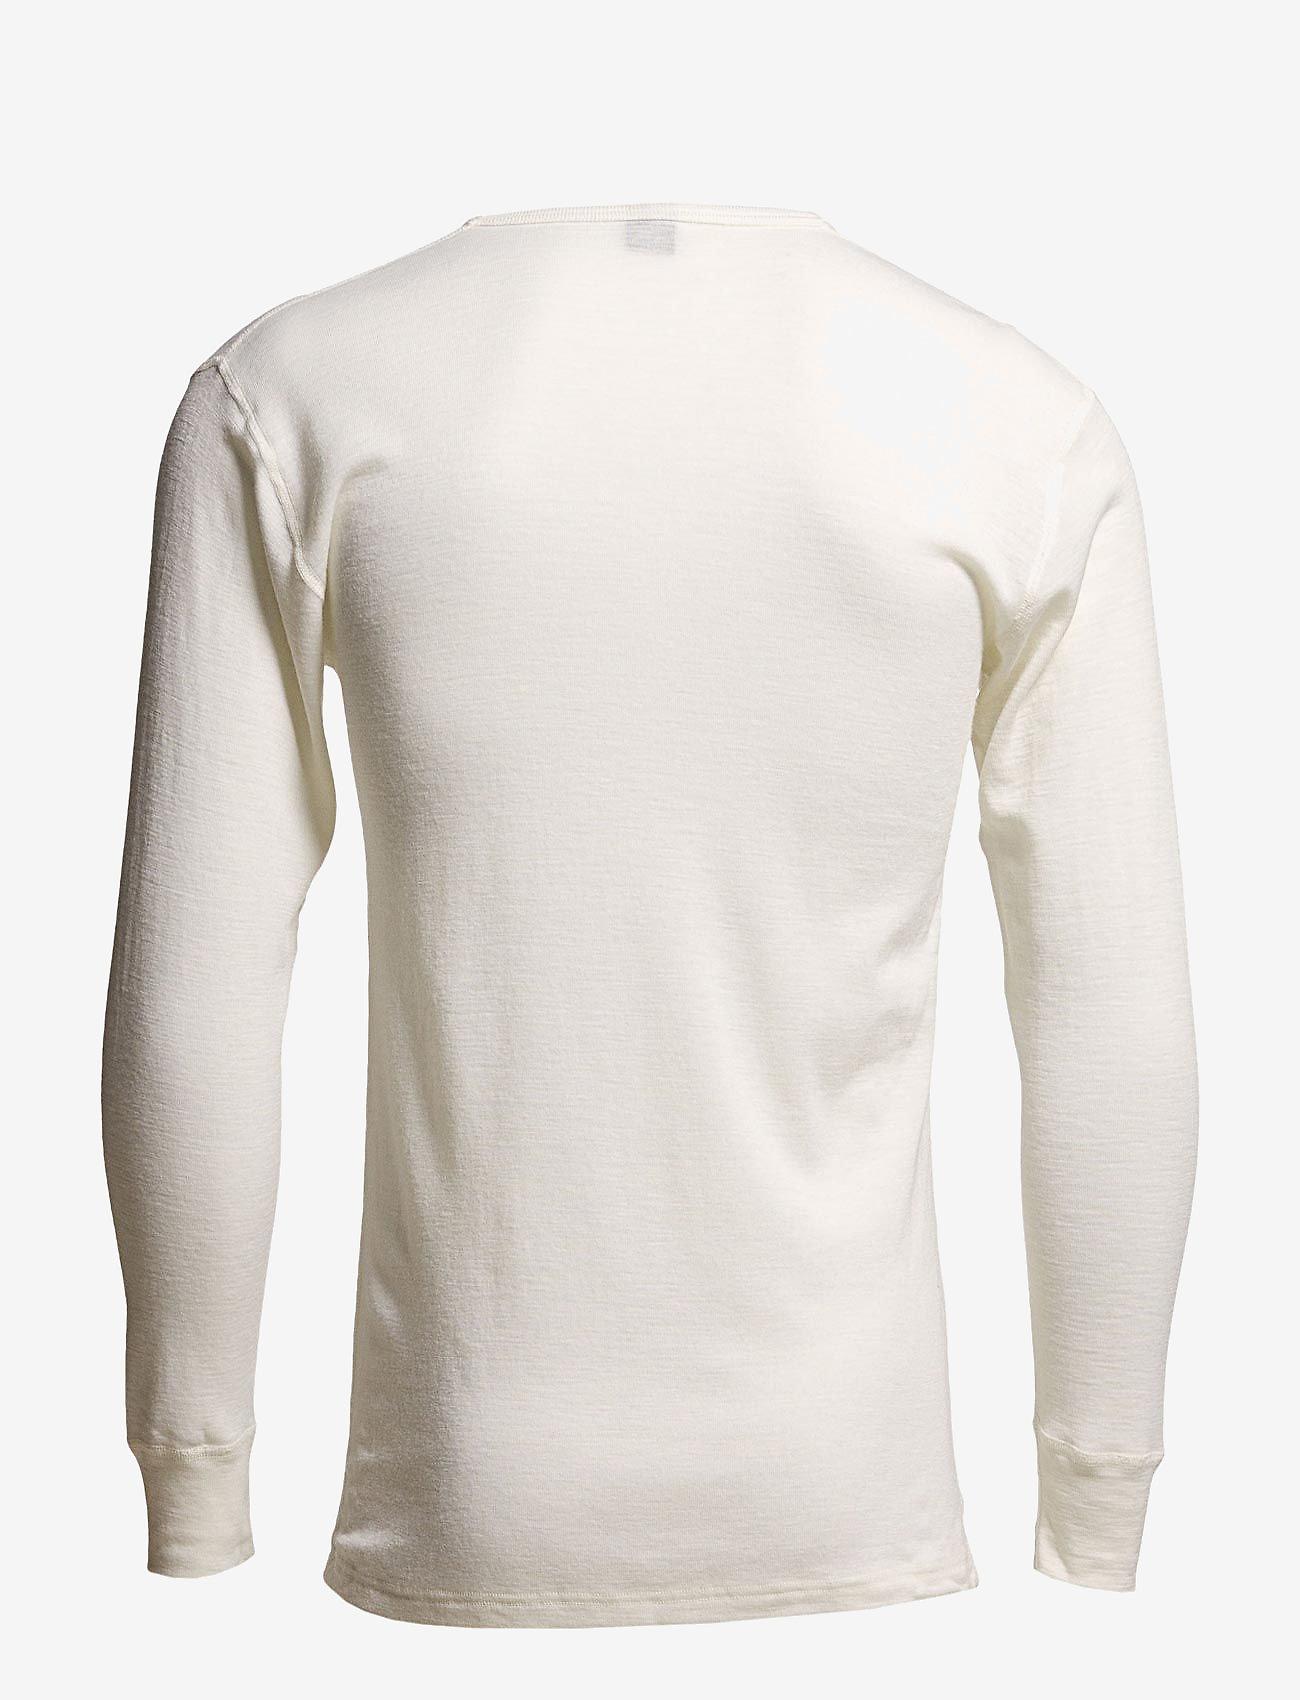 JBS - JBS, t-shirt long sleeve - basic t-krekli - white - 1